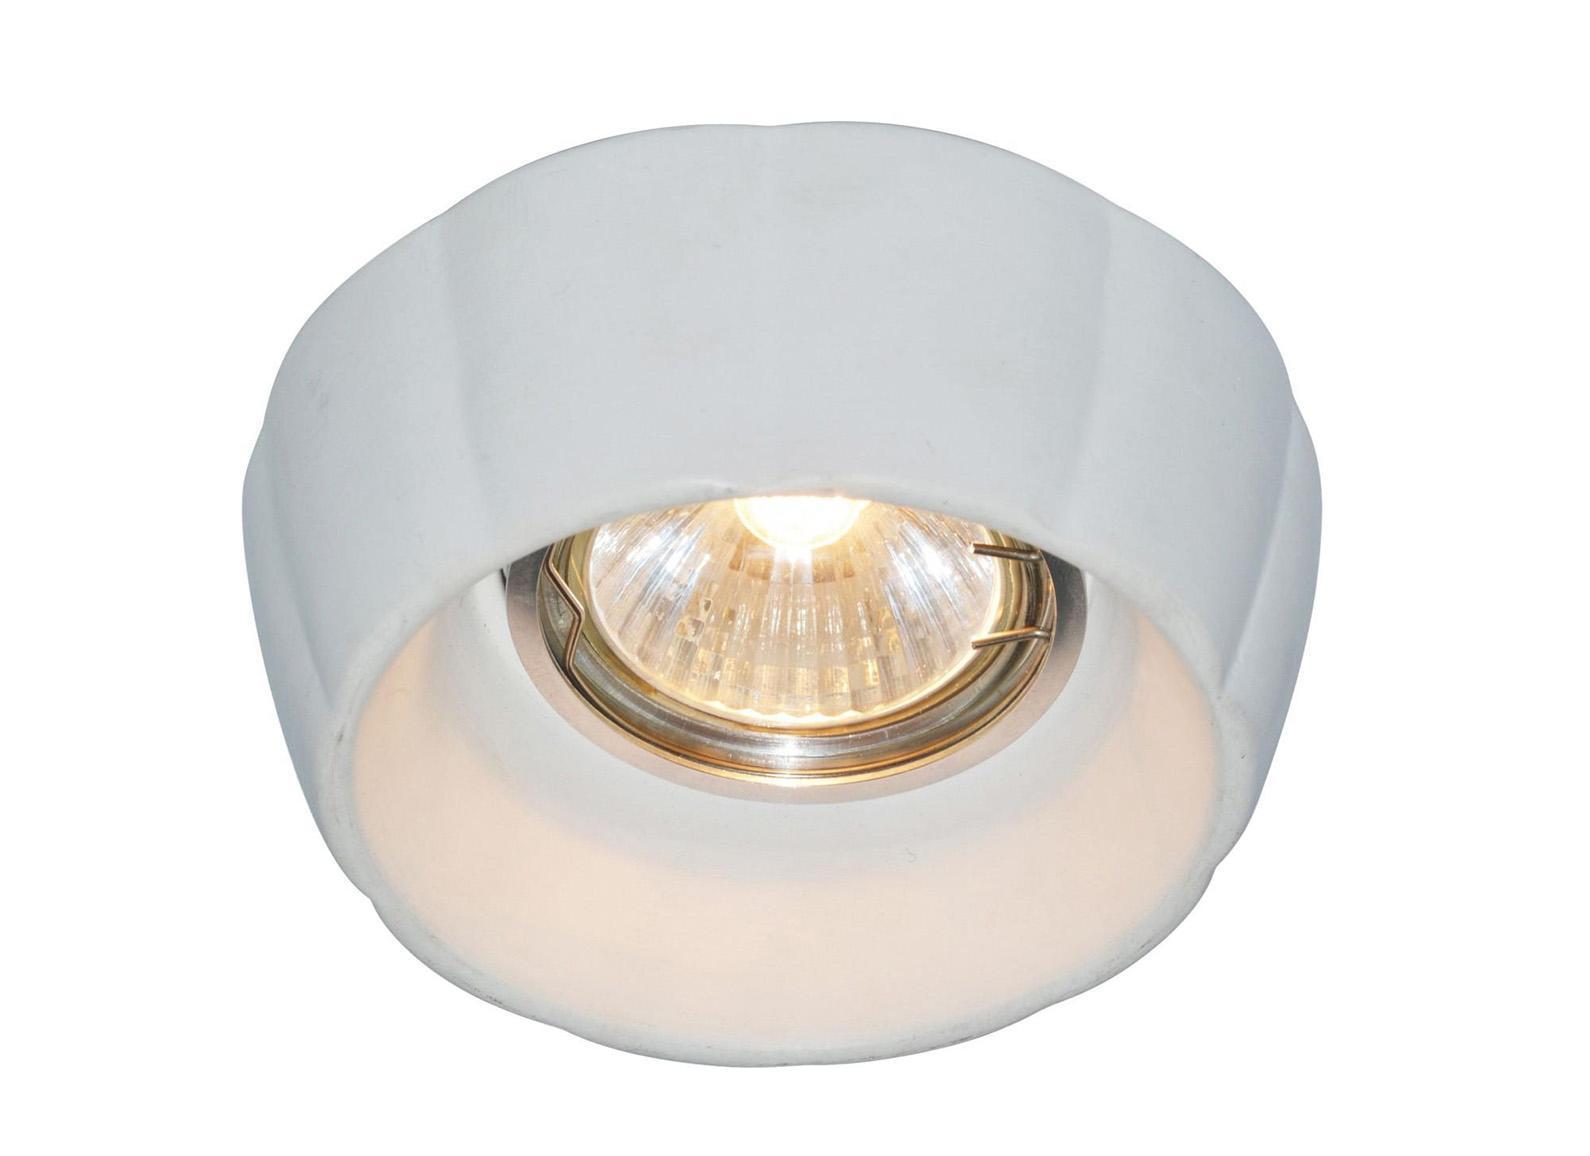 A5242PL-1WH CRATERE Встраиваемый светильникA5242PL-1WH1x50W; патроны GU10 и G5,3 в комплекте Материал: Арматура: КерамикаРазмер: 104x104x55Цвет: Белый